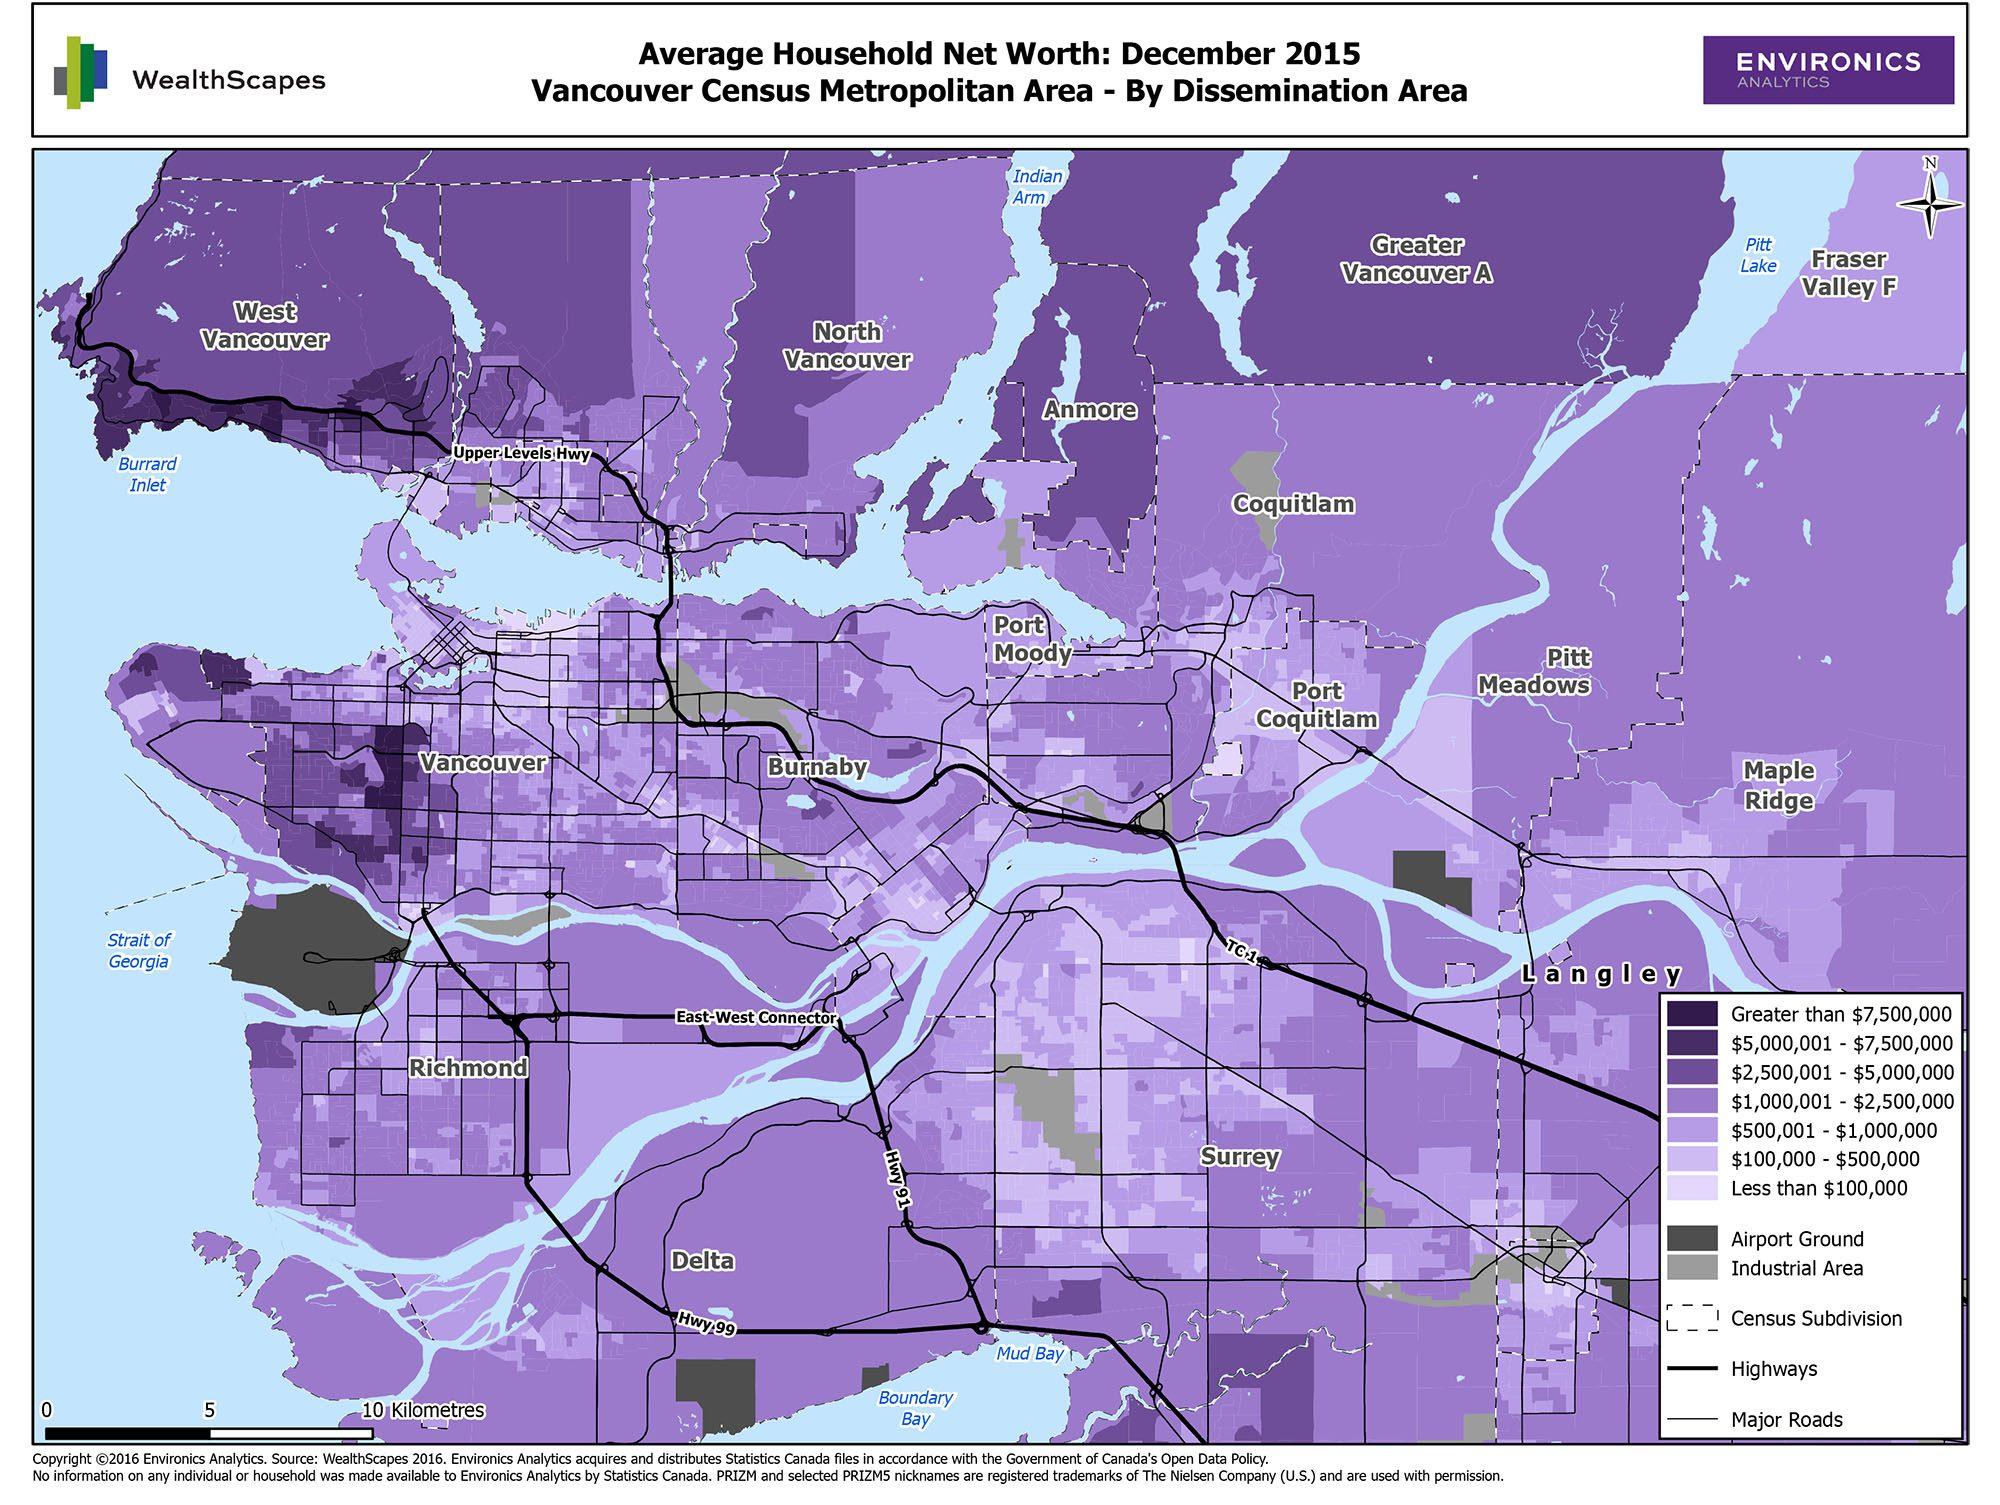 Map of Average Household Net Worth in Vancouver Census Metropolitan Area (Environics Analytics)